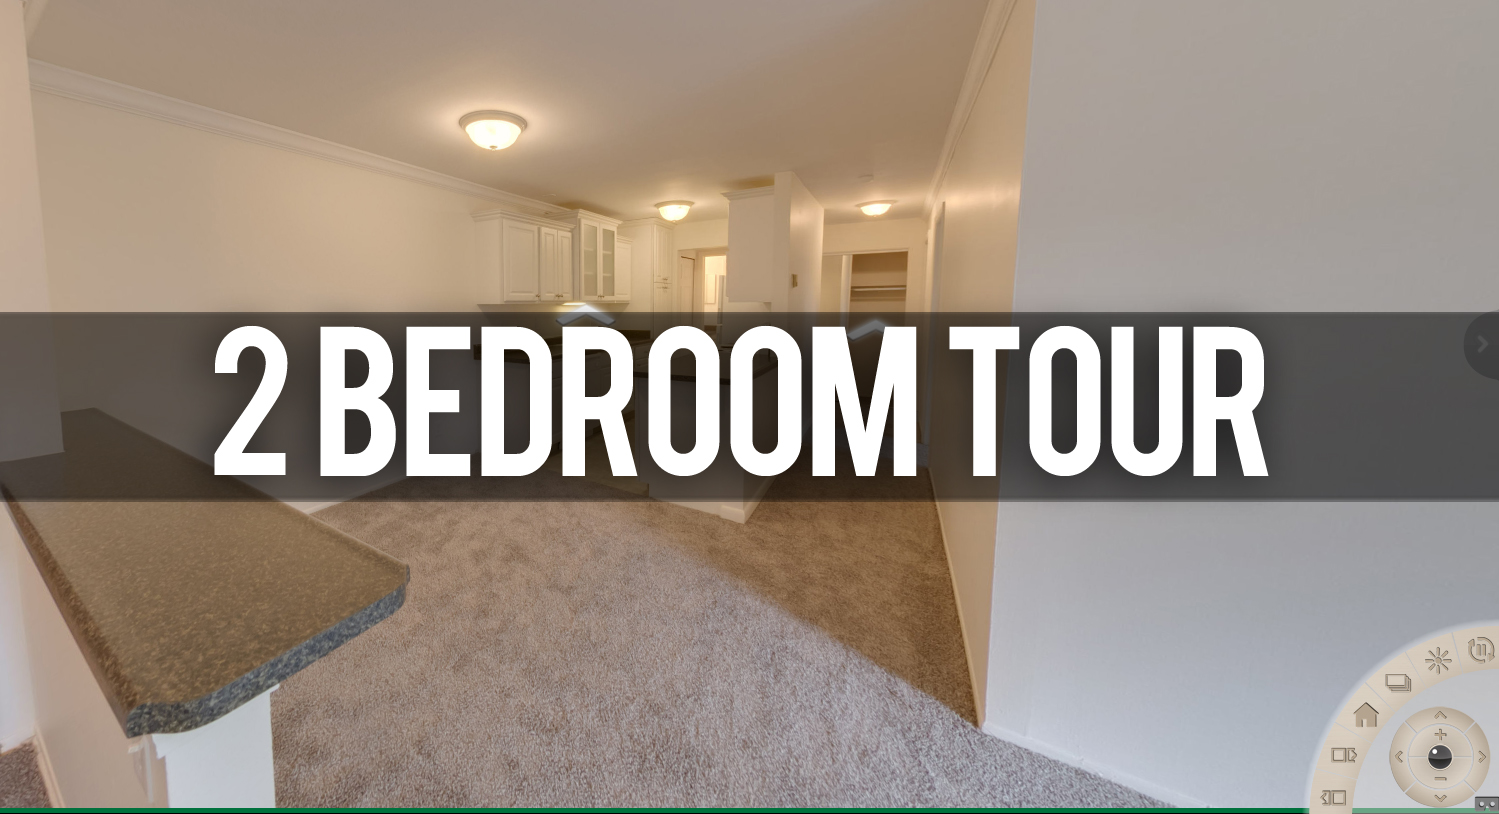 Virtual Tour 2 Bedroom Apartment at Berrytree Apartments in Okemos, MI